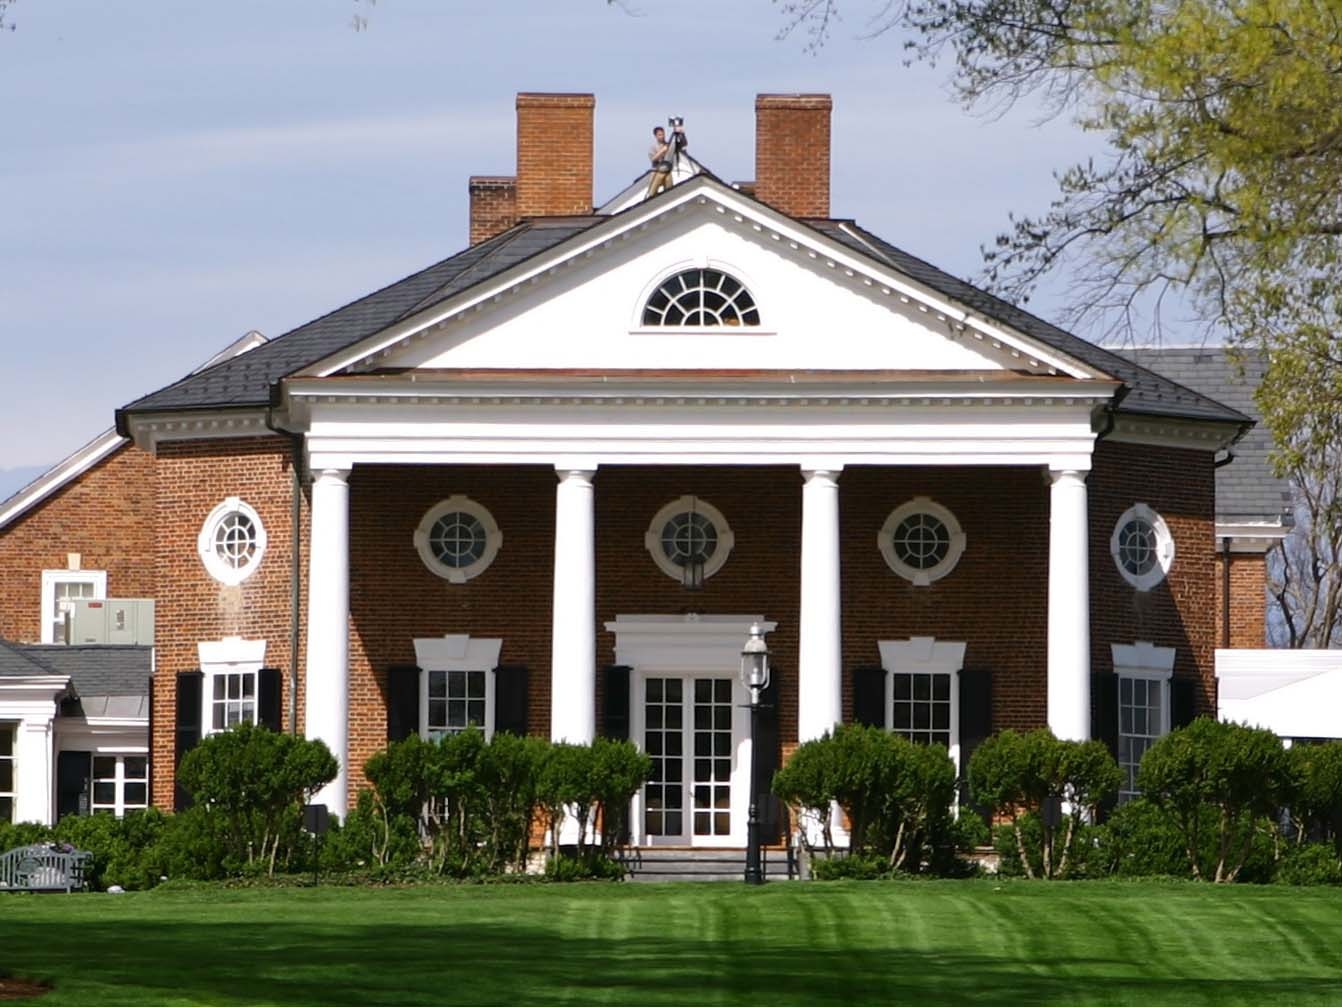 FARMINGTON COUNTRY CLUB - CHARLOTTESVILLE, VA - 1803 THOMAS JEFFERSON